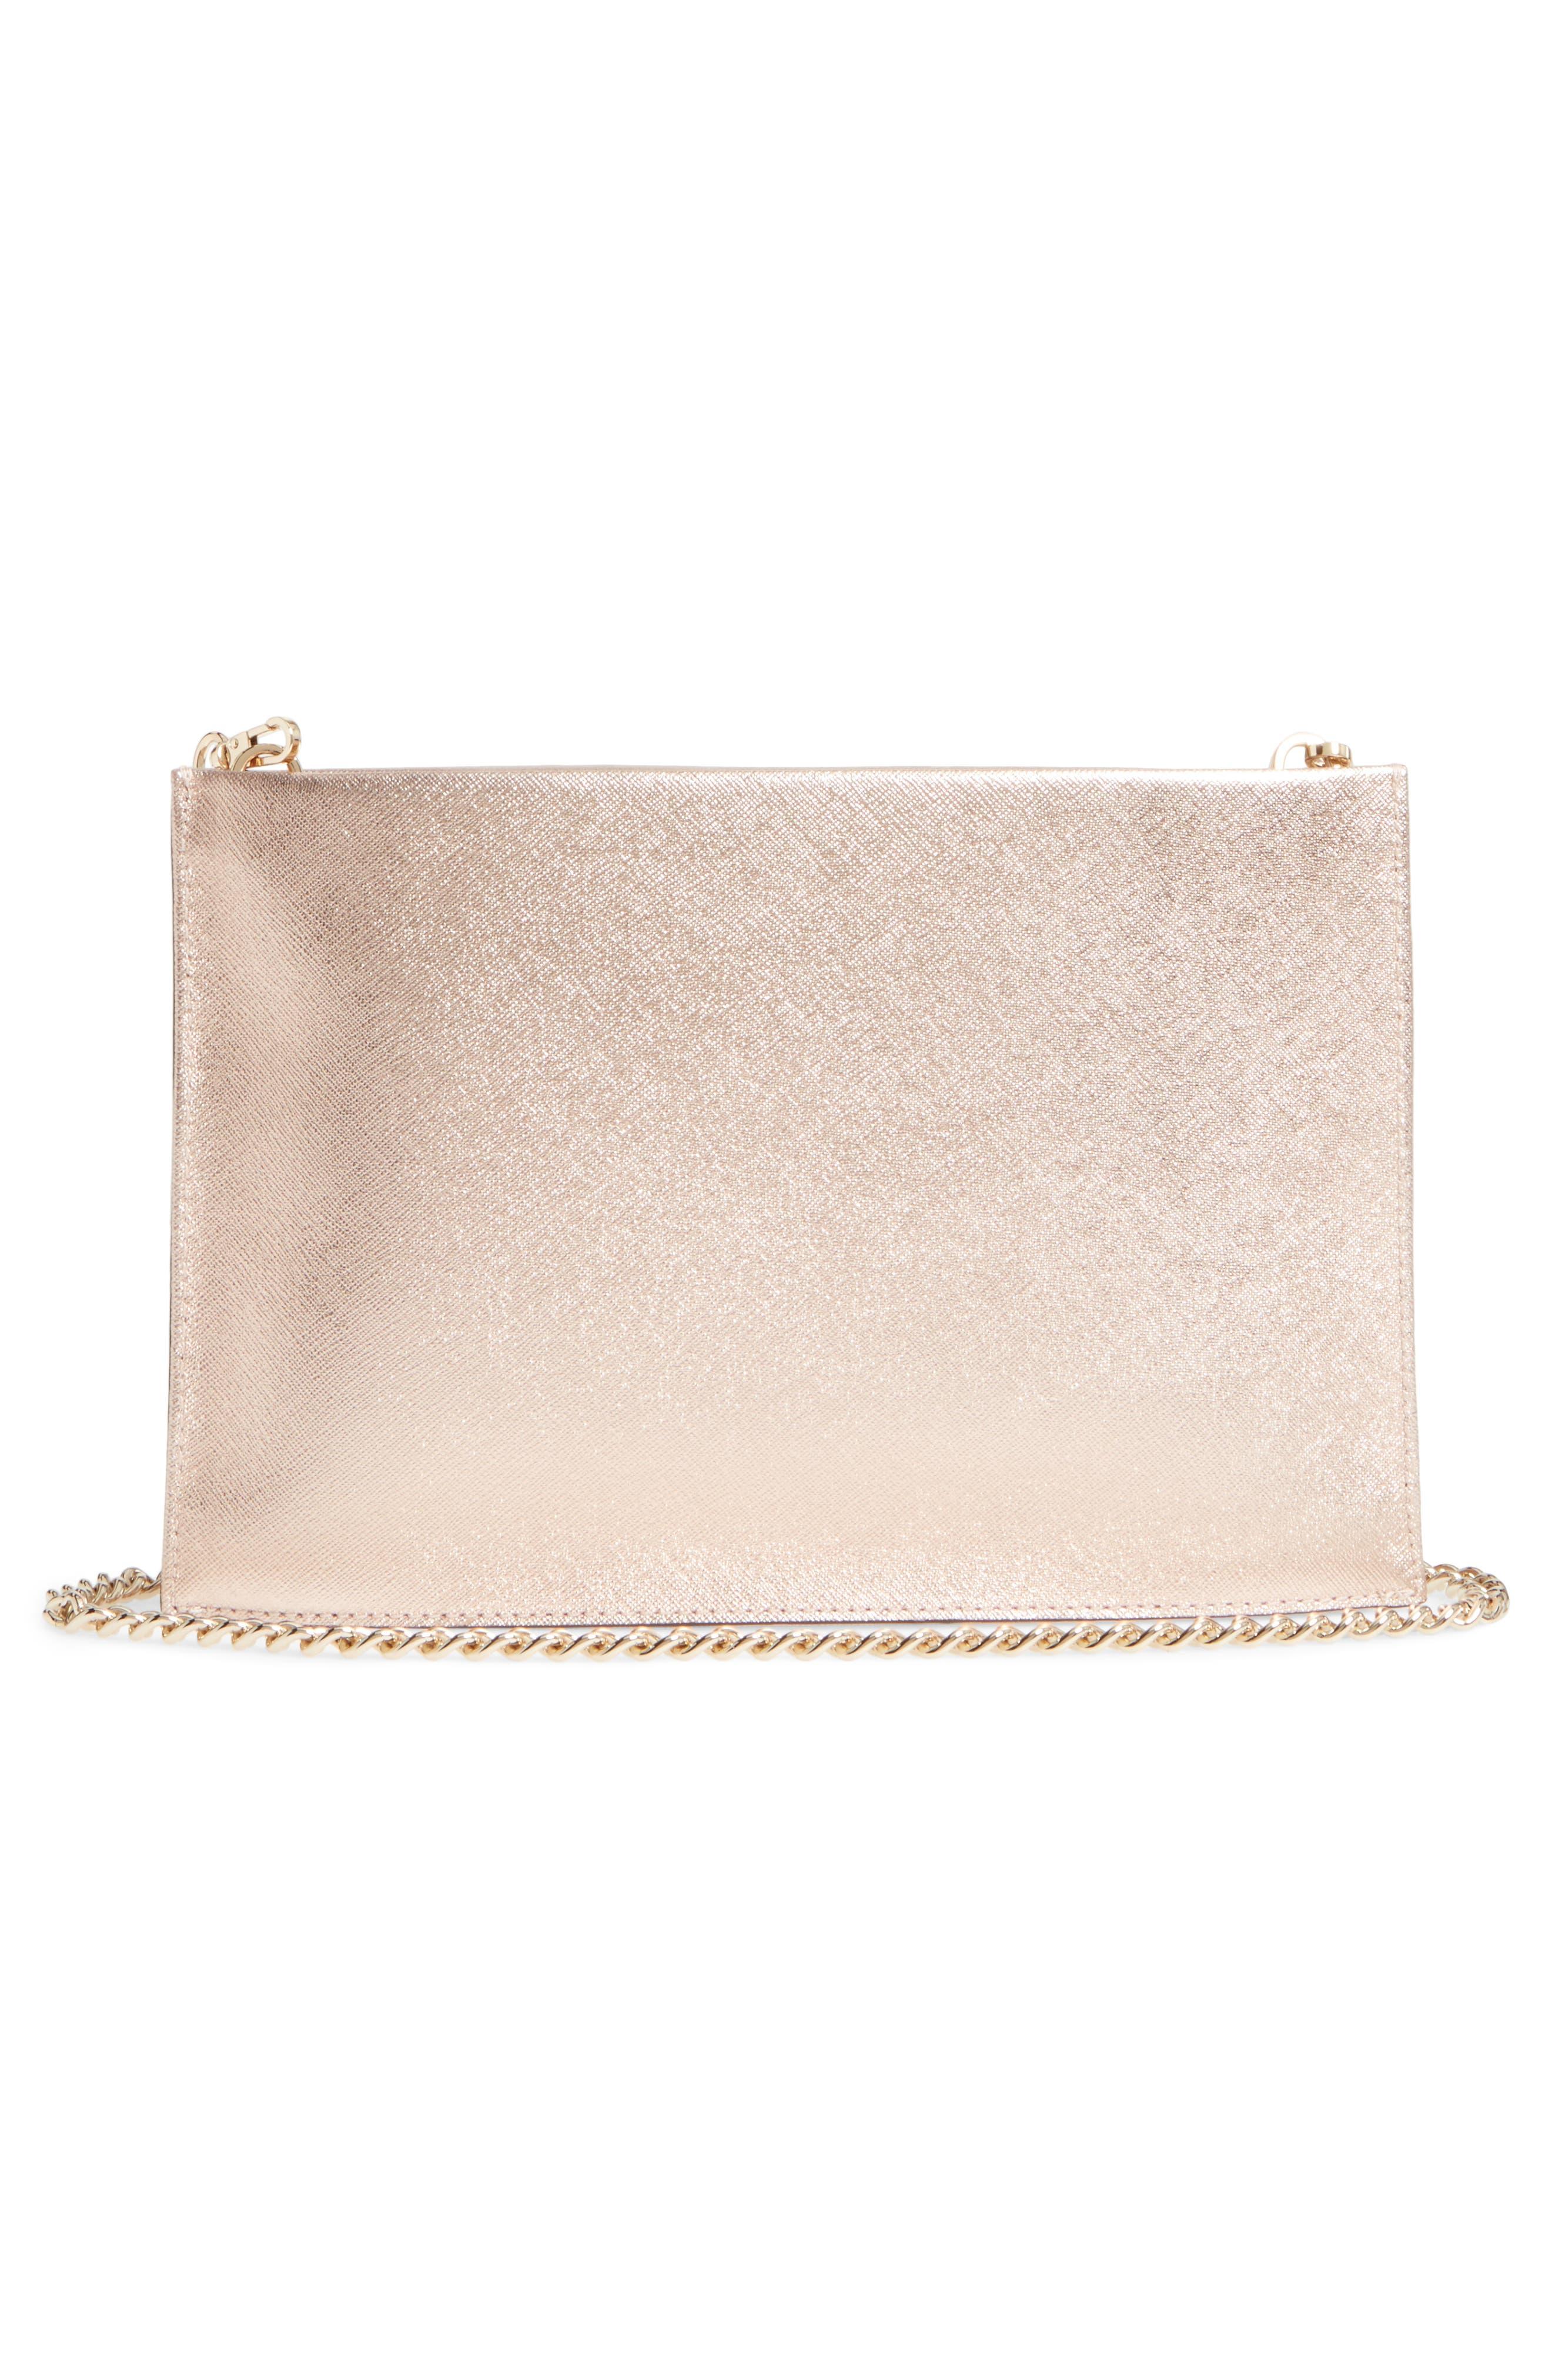 cameron street - sima leather crossbody bag,                             Alternate thumbnail 3, color,                             650